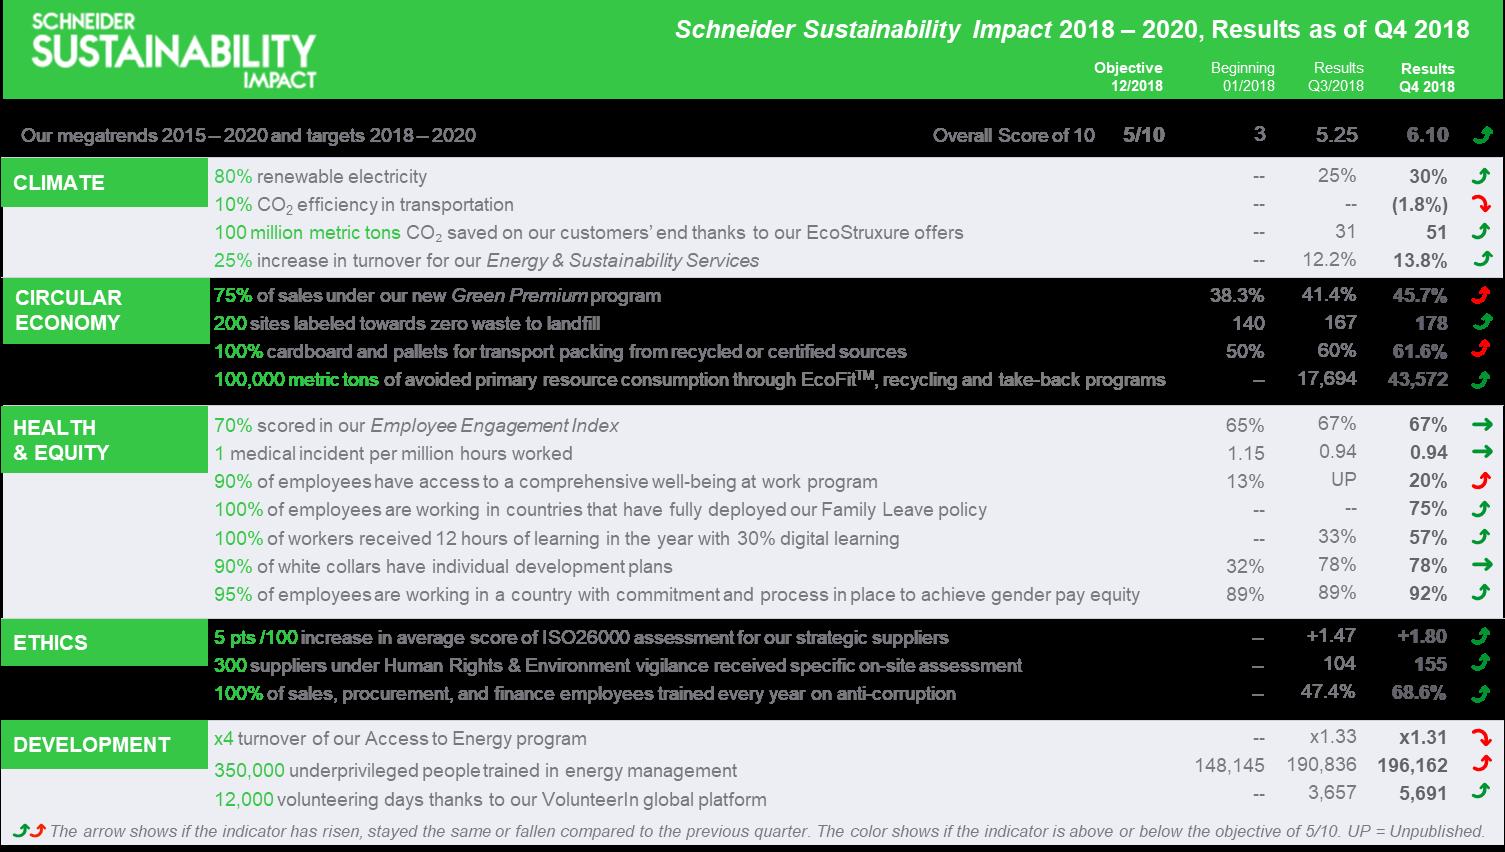 Impactul de sustenabilitate Schneider Electric